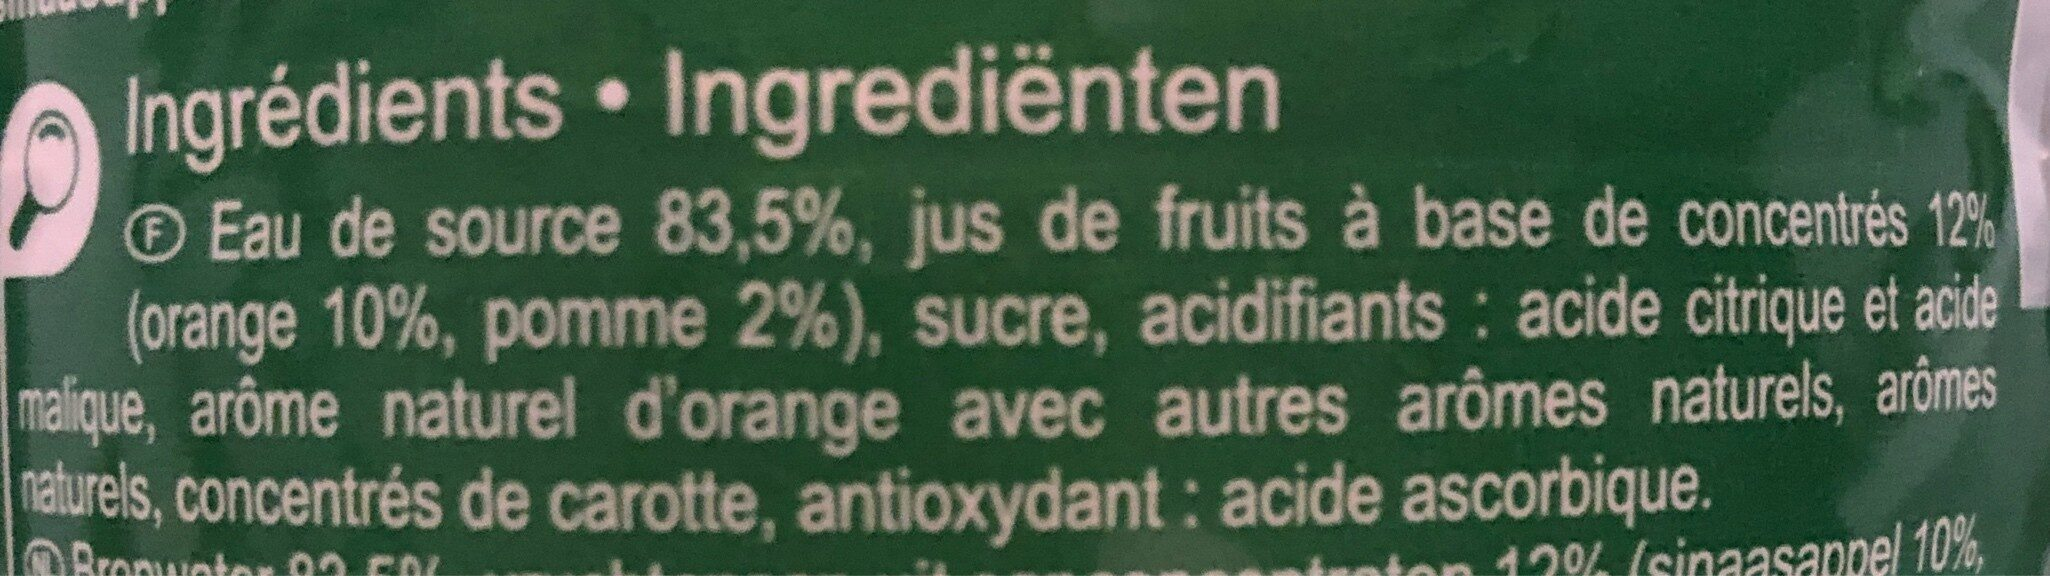 Saveur  orange - Ingrédients - fr